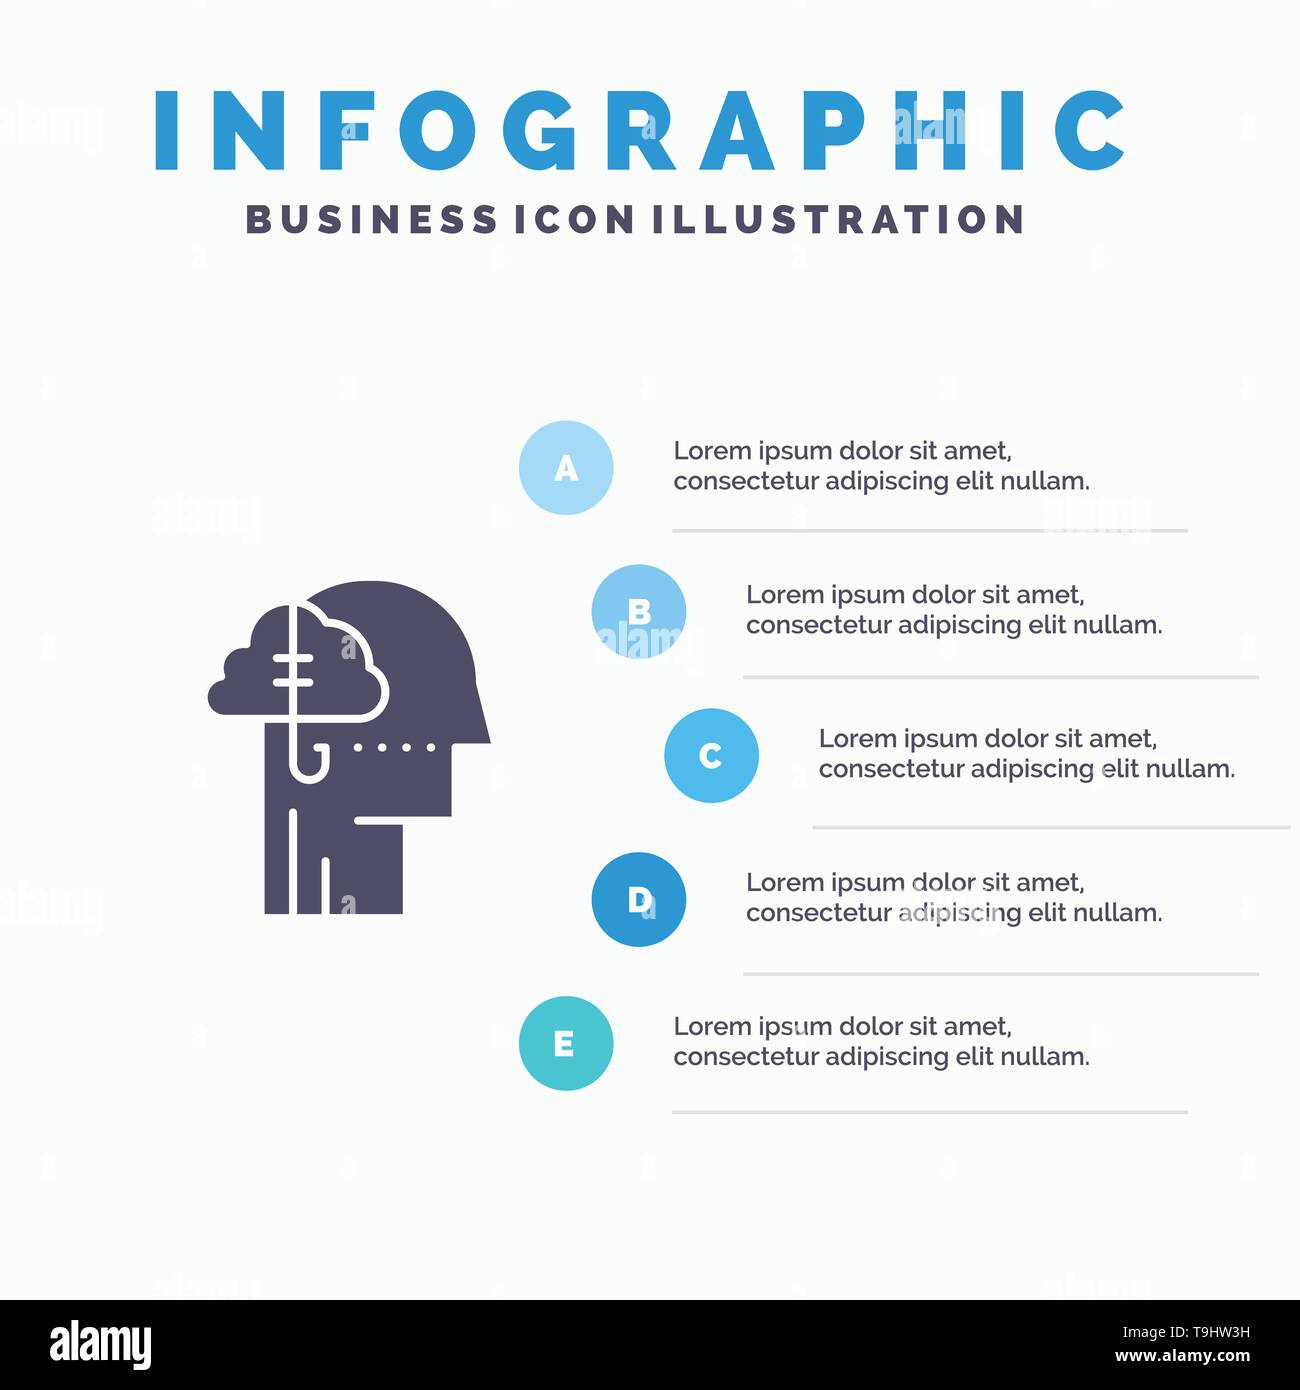 Borrowing Ideas, Addiction, Catch, Habit, Human Solid Icon Infographics 5 Steps Presentation Background - Stock Image